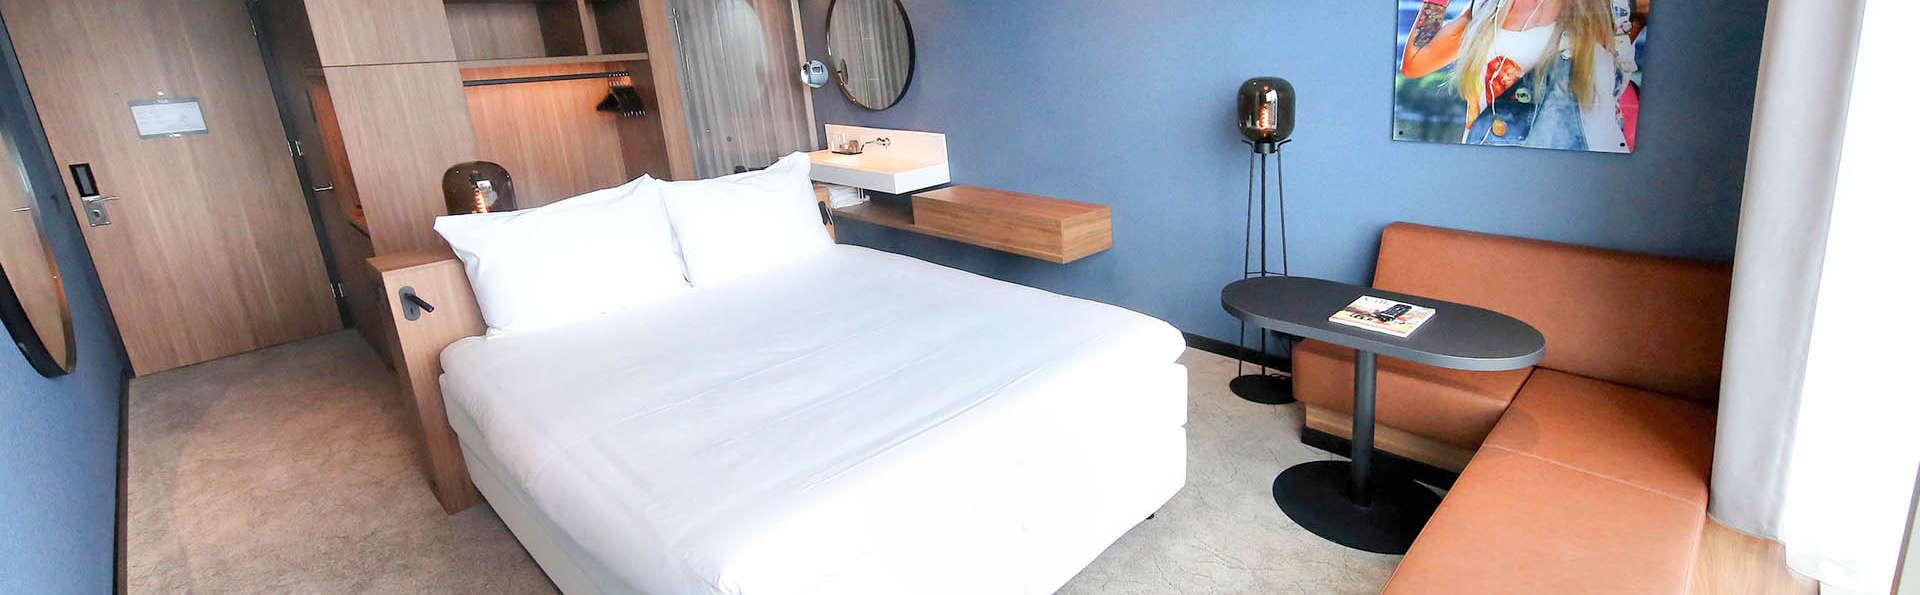 Van der Valk Hotel Amsterdam Zuidas - EDIT_BEDROOM_01.jpg